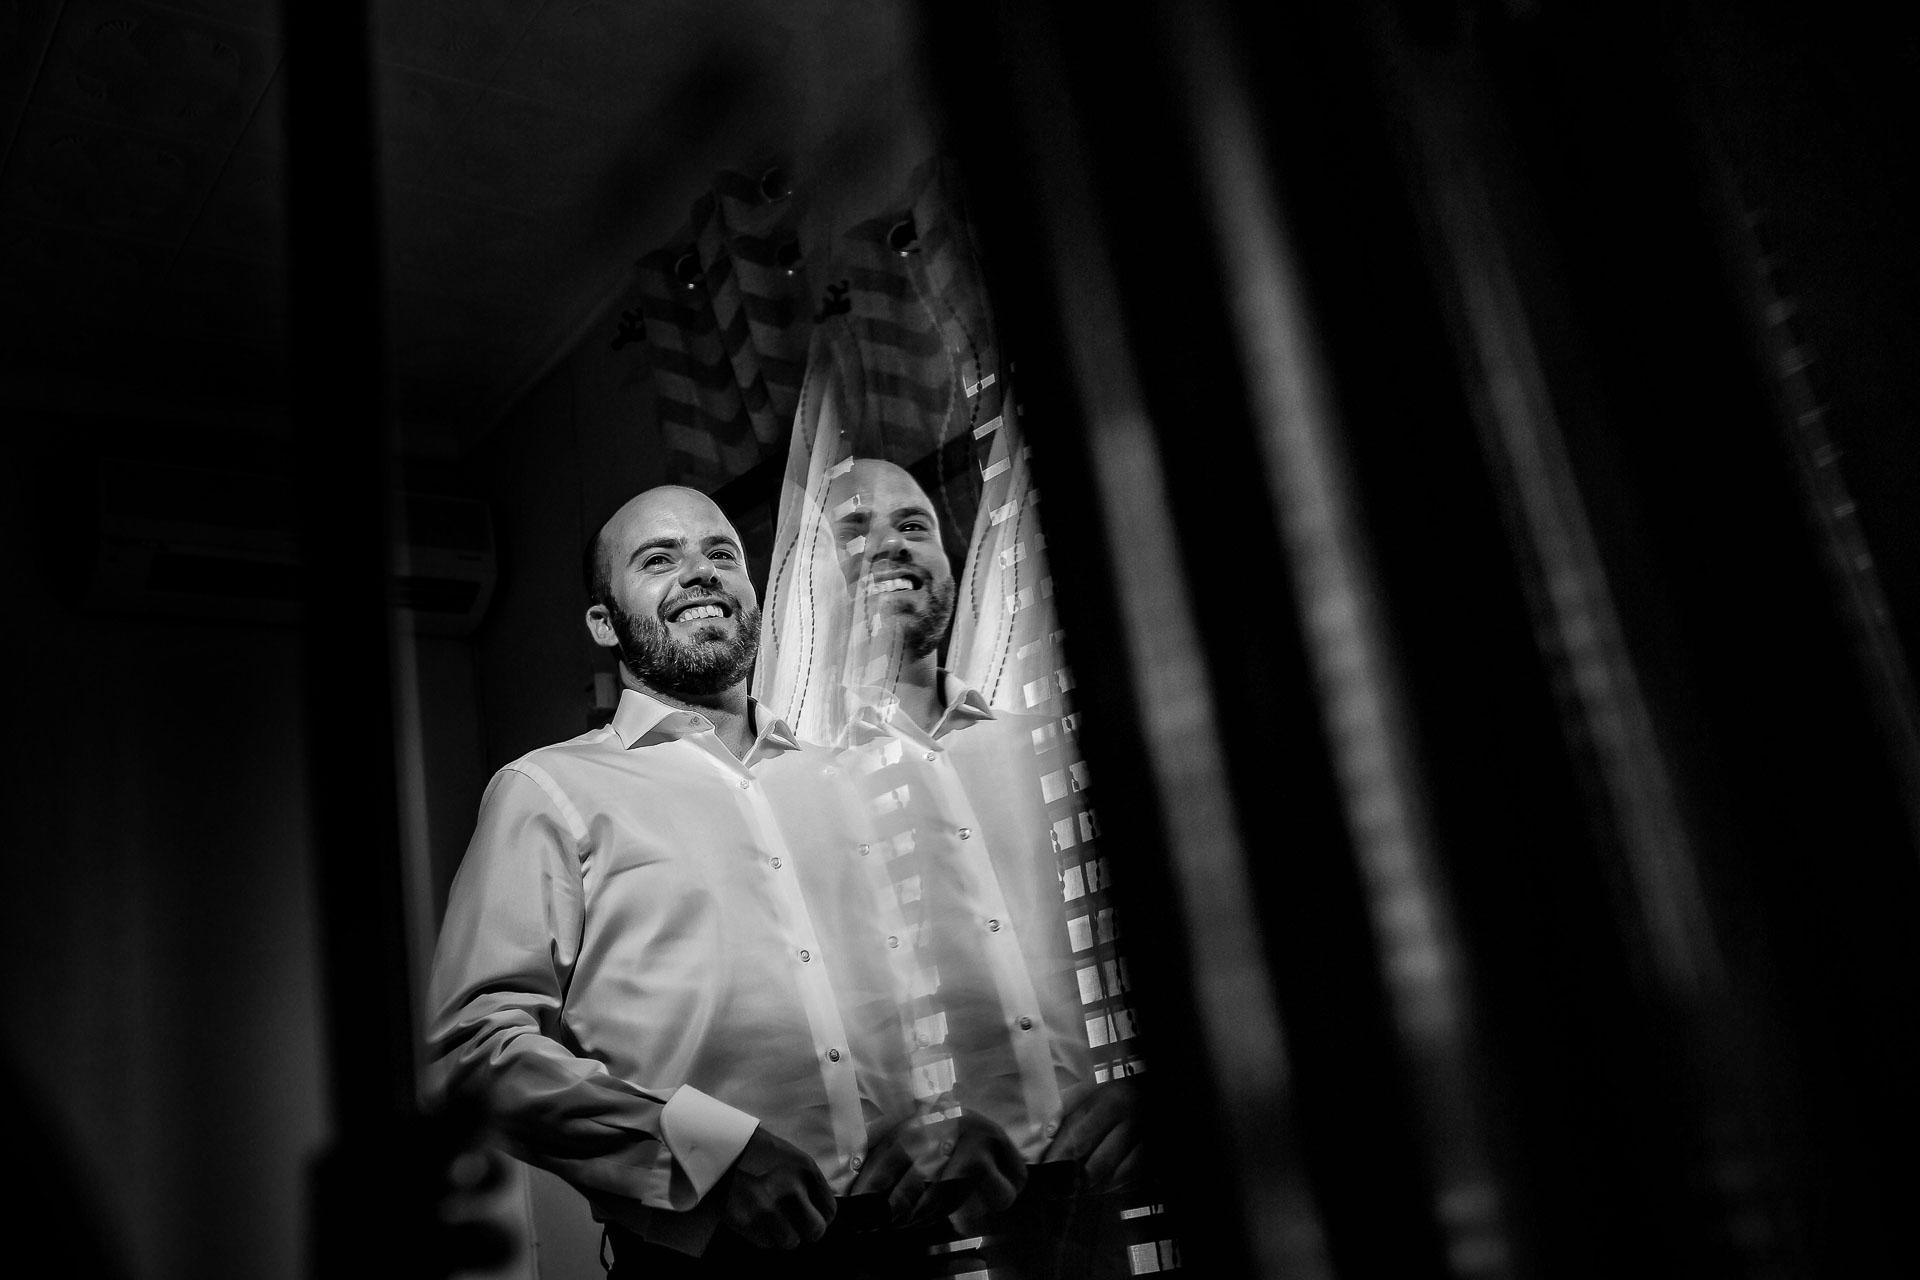 Reportaje Boda en Sevilla Beatriz y Norato, Christian Roselló Fotógrafo de Bodas en Sevilla con sede en Valencia.